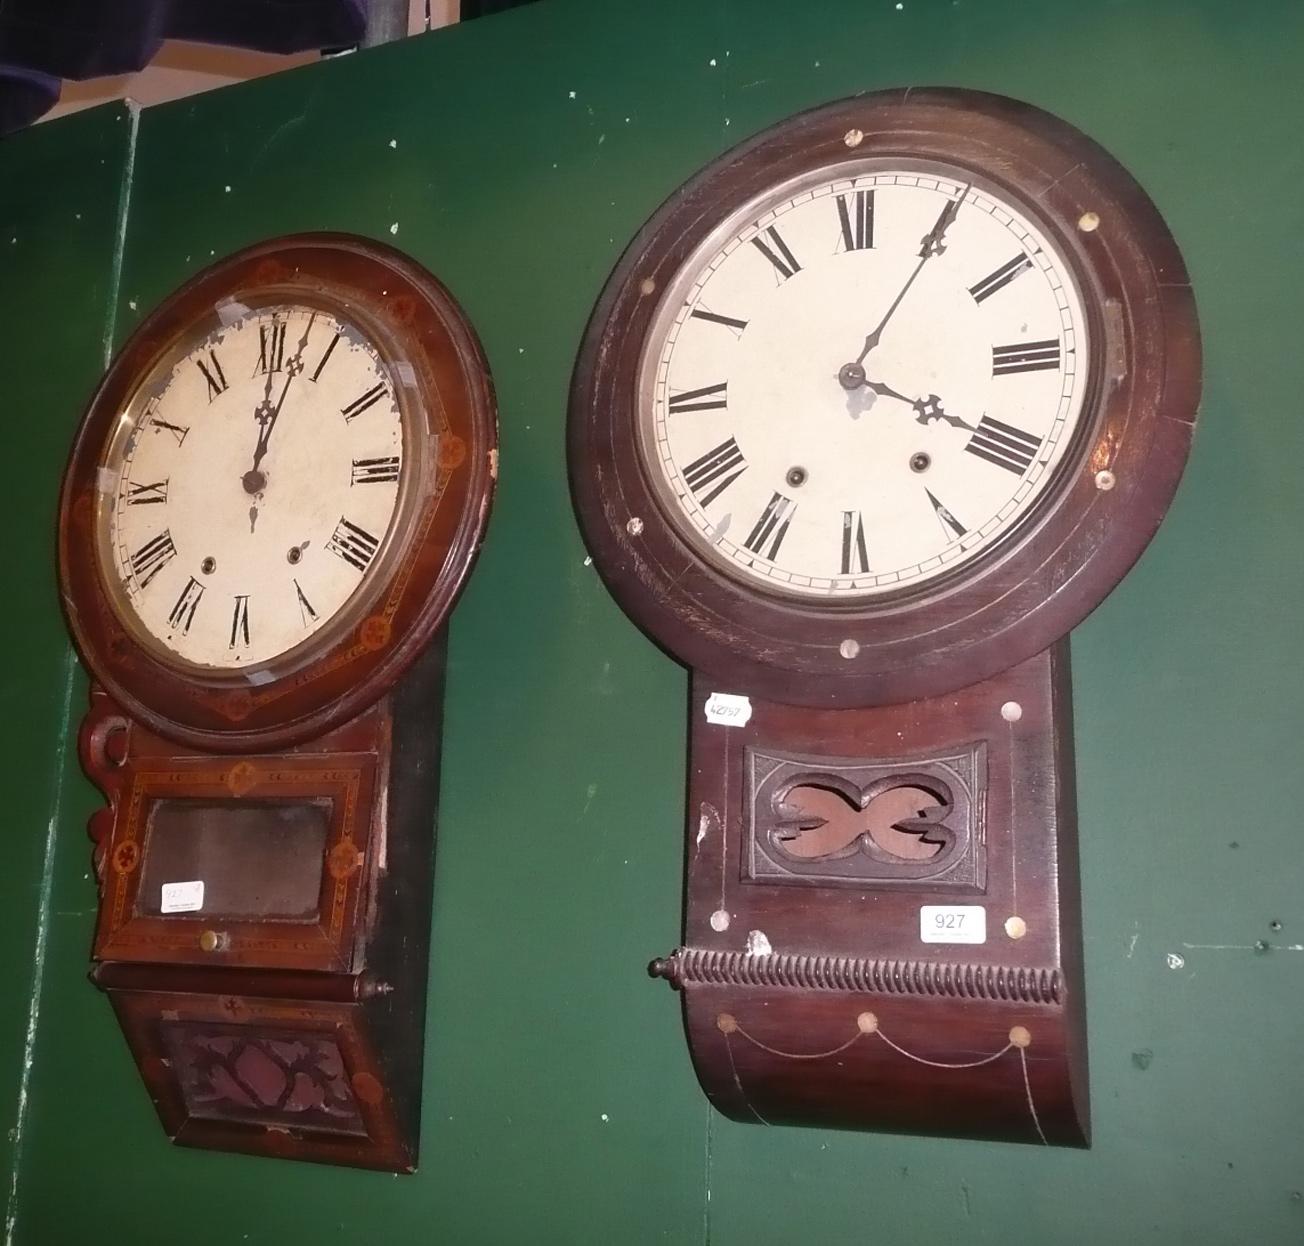 Tennants Auctioneers Two Striking Wall Clocks